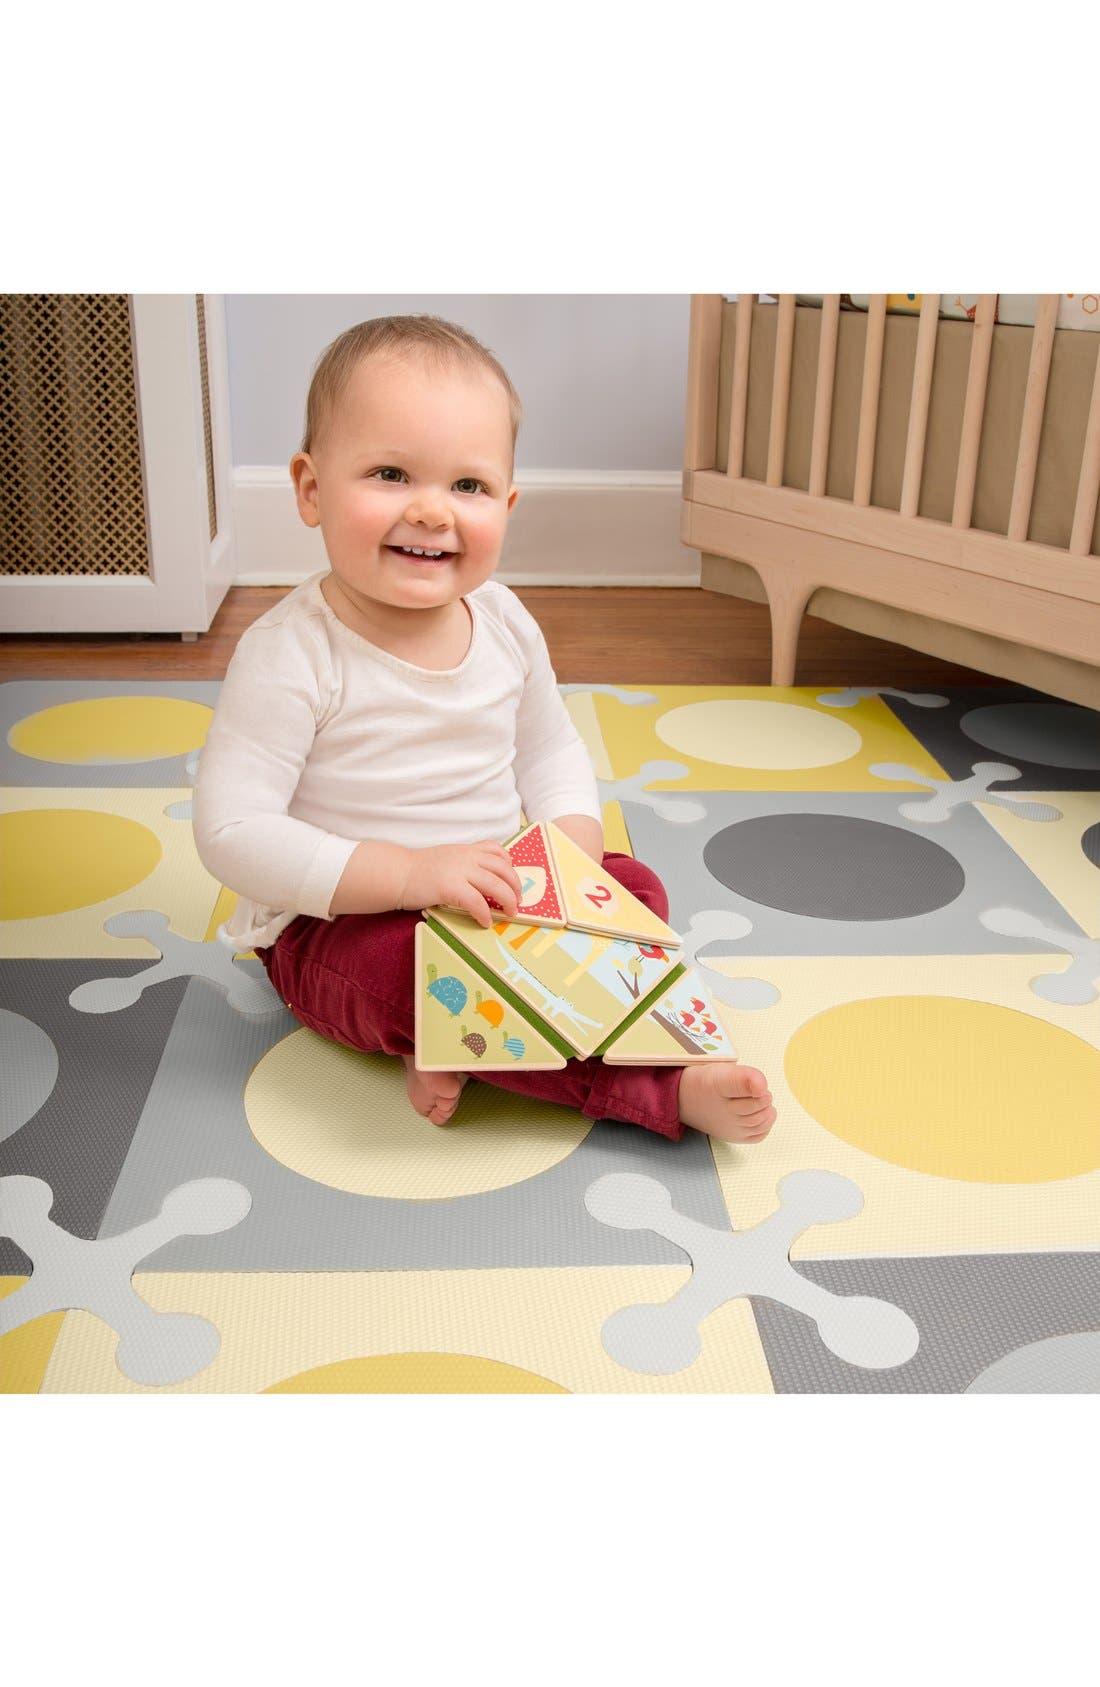 'Playspot' Floor Tiles,                             Alternate thumbnail 3, color,                             Gray/ Gold